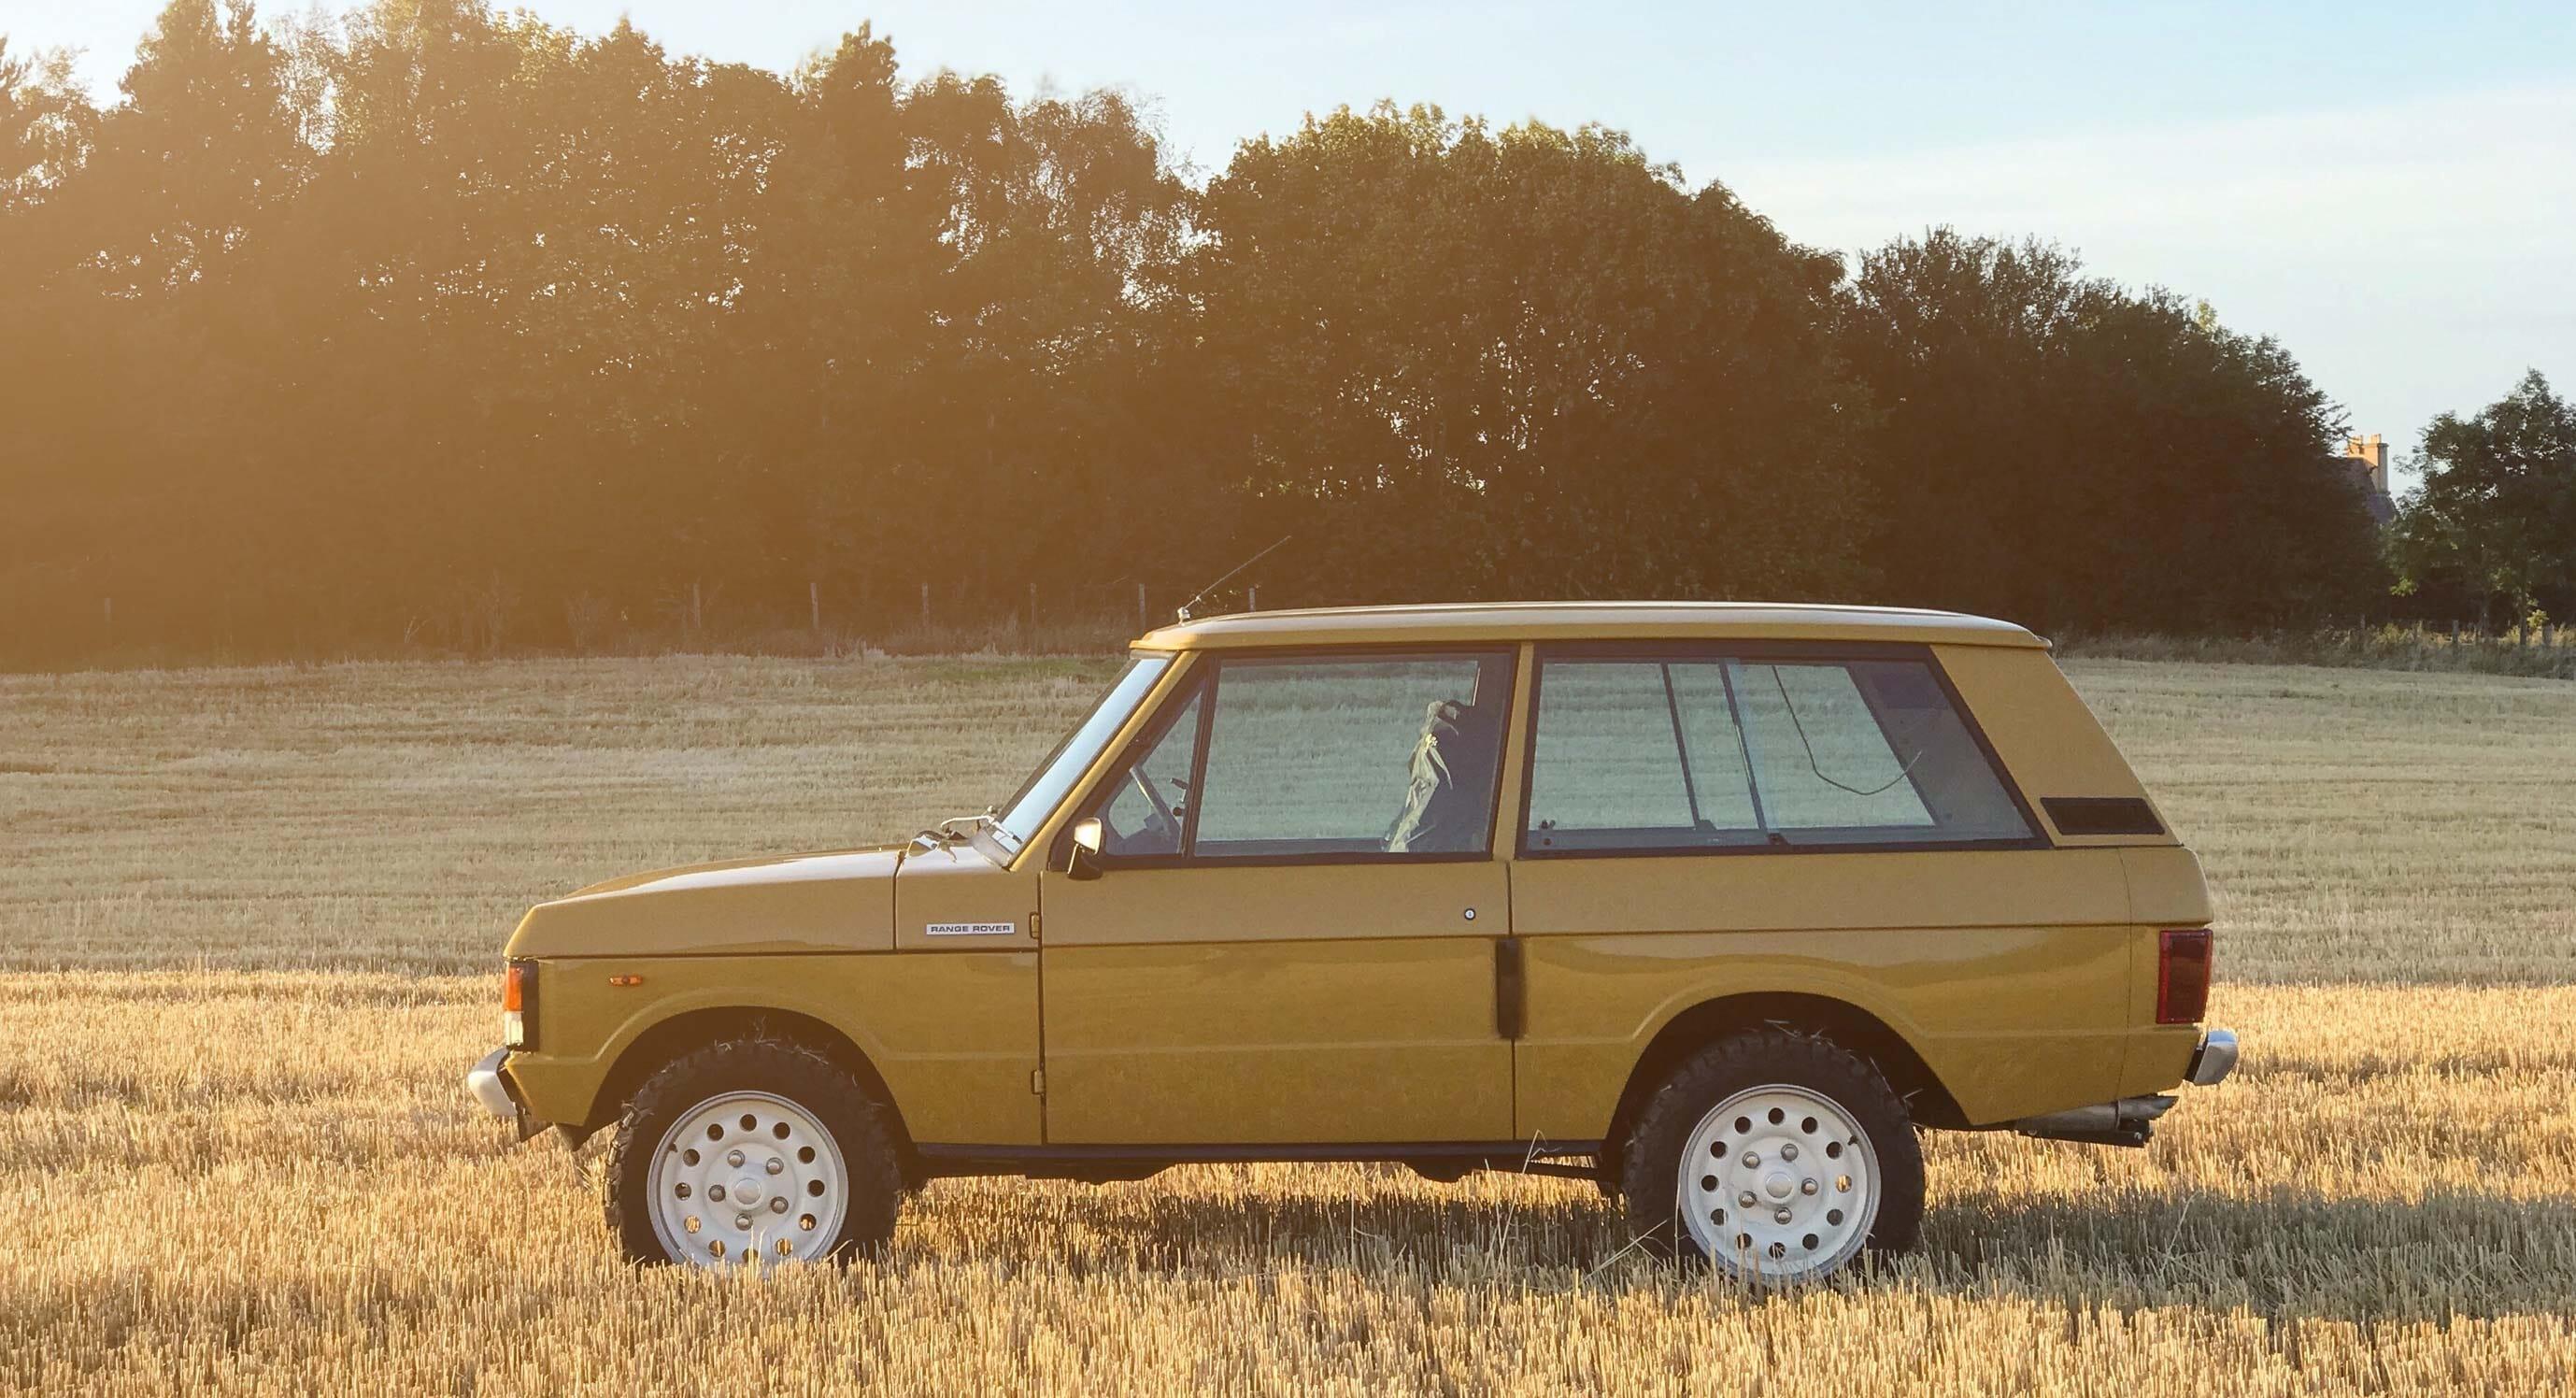 OUTLANDER's 1980 Range Rover: Faithful restoration